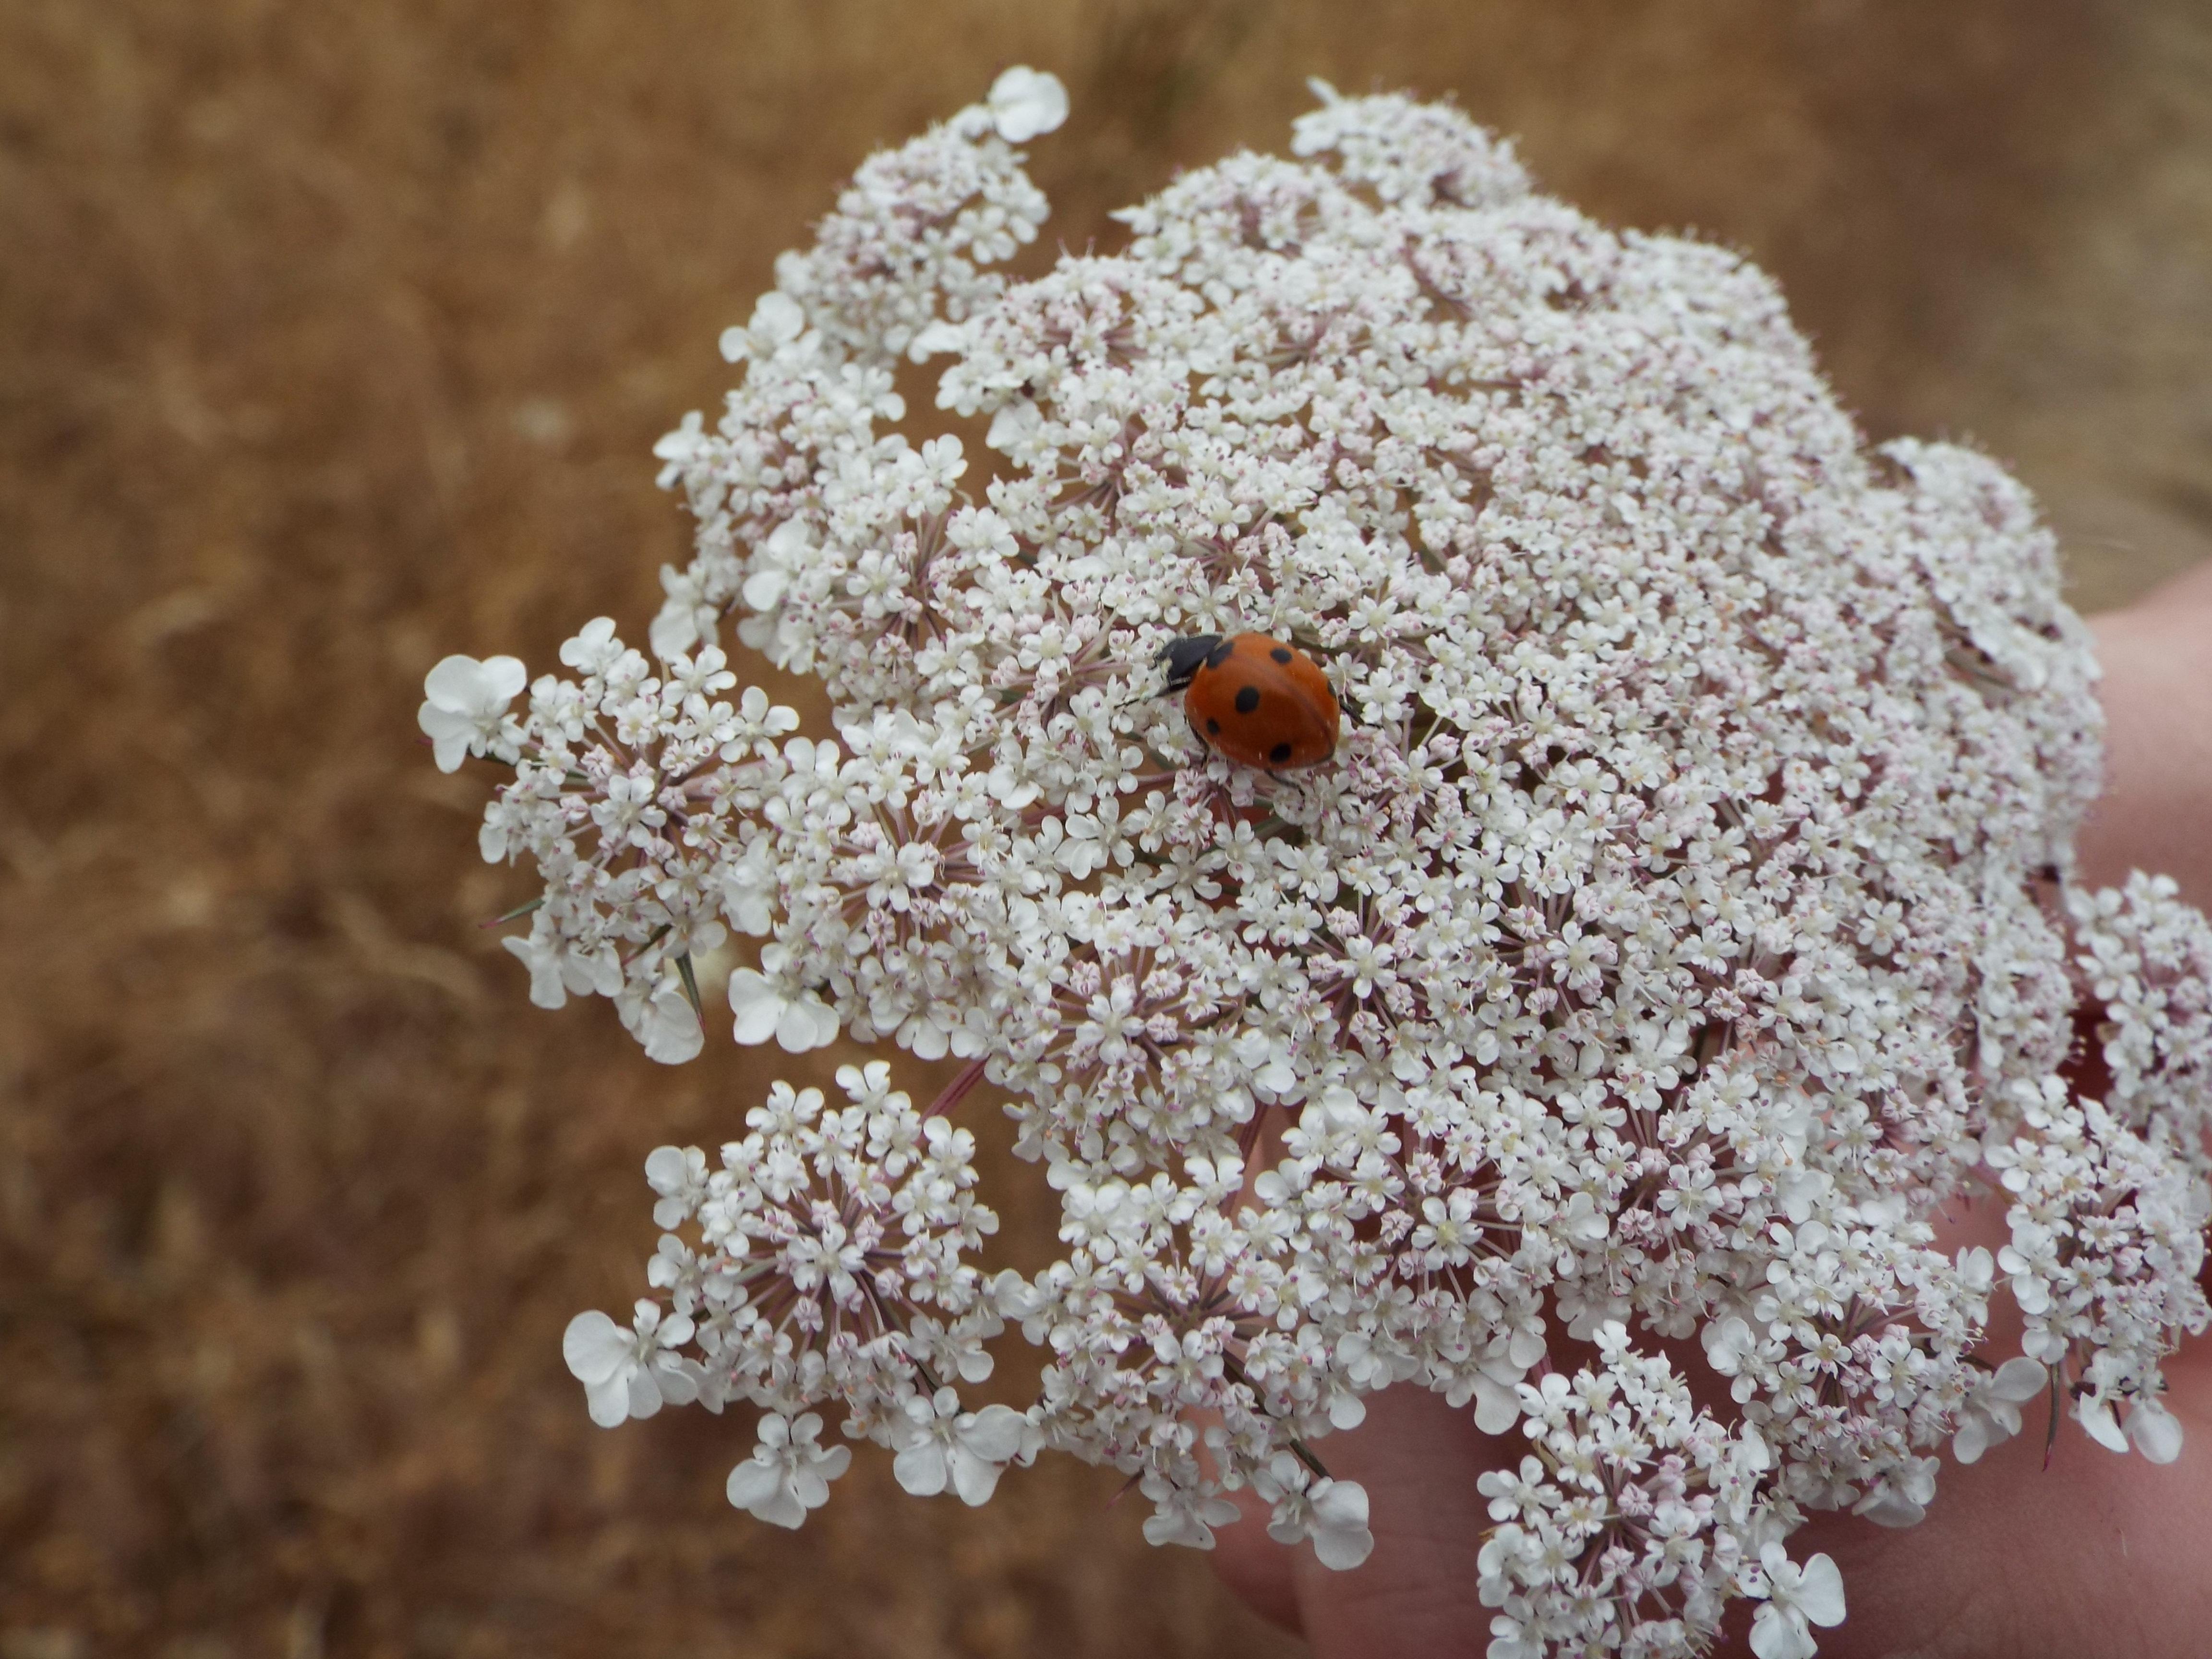 Queen anne's lace wildflower of willamette valley oregon